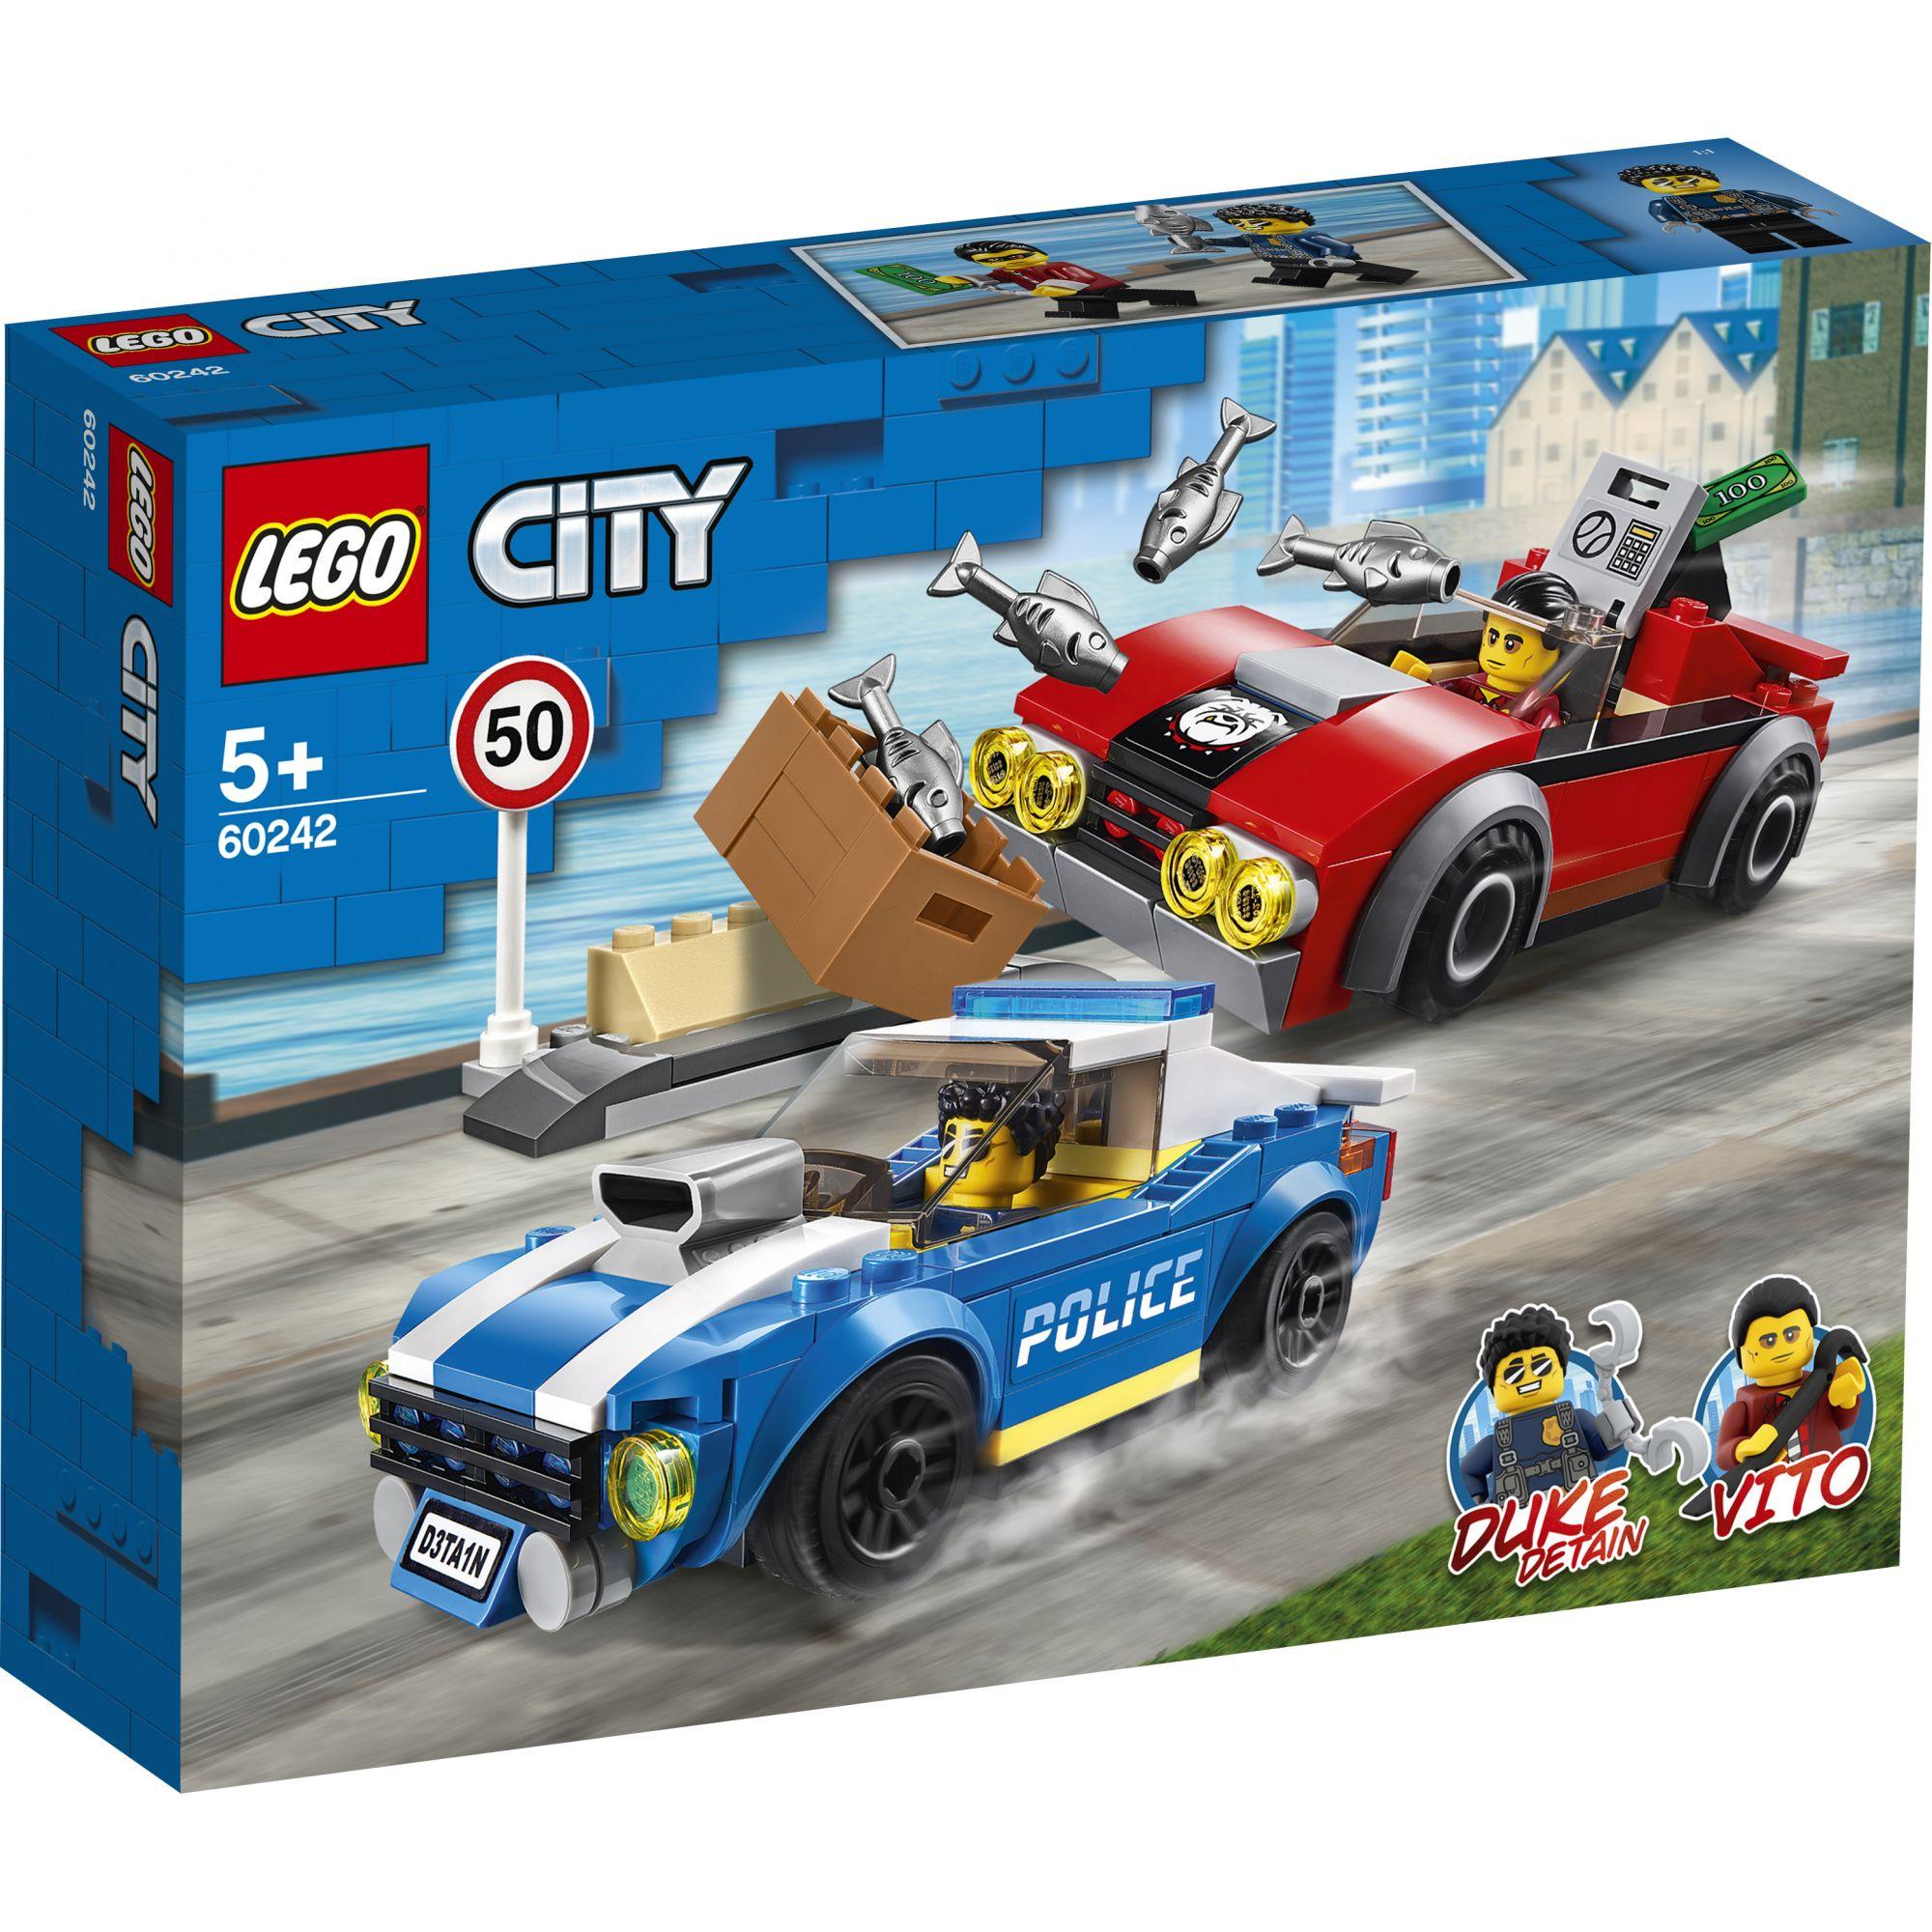 LEGO City Arresto su strada della polizia - 60242 LEGO CITY